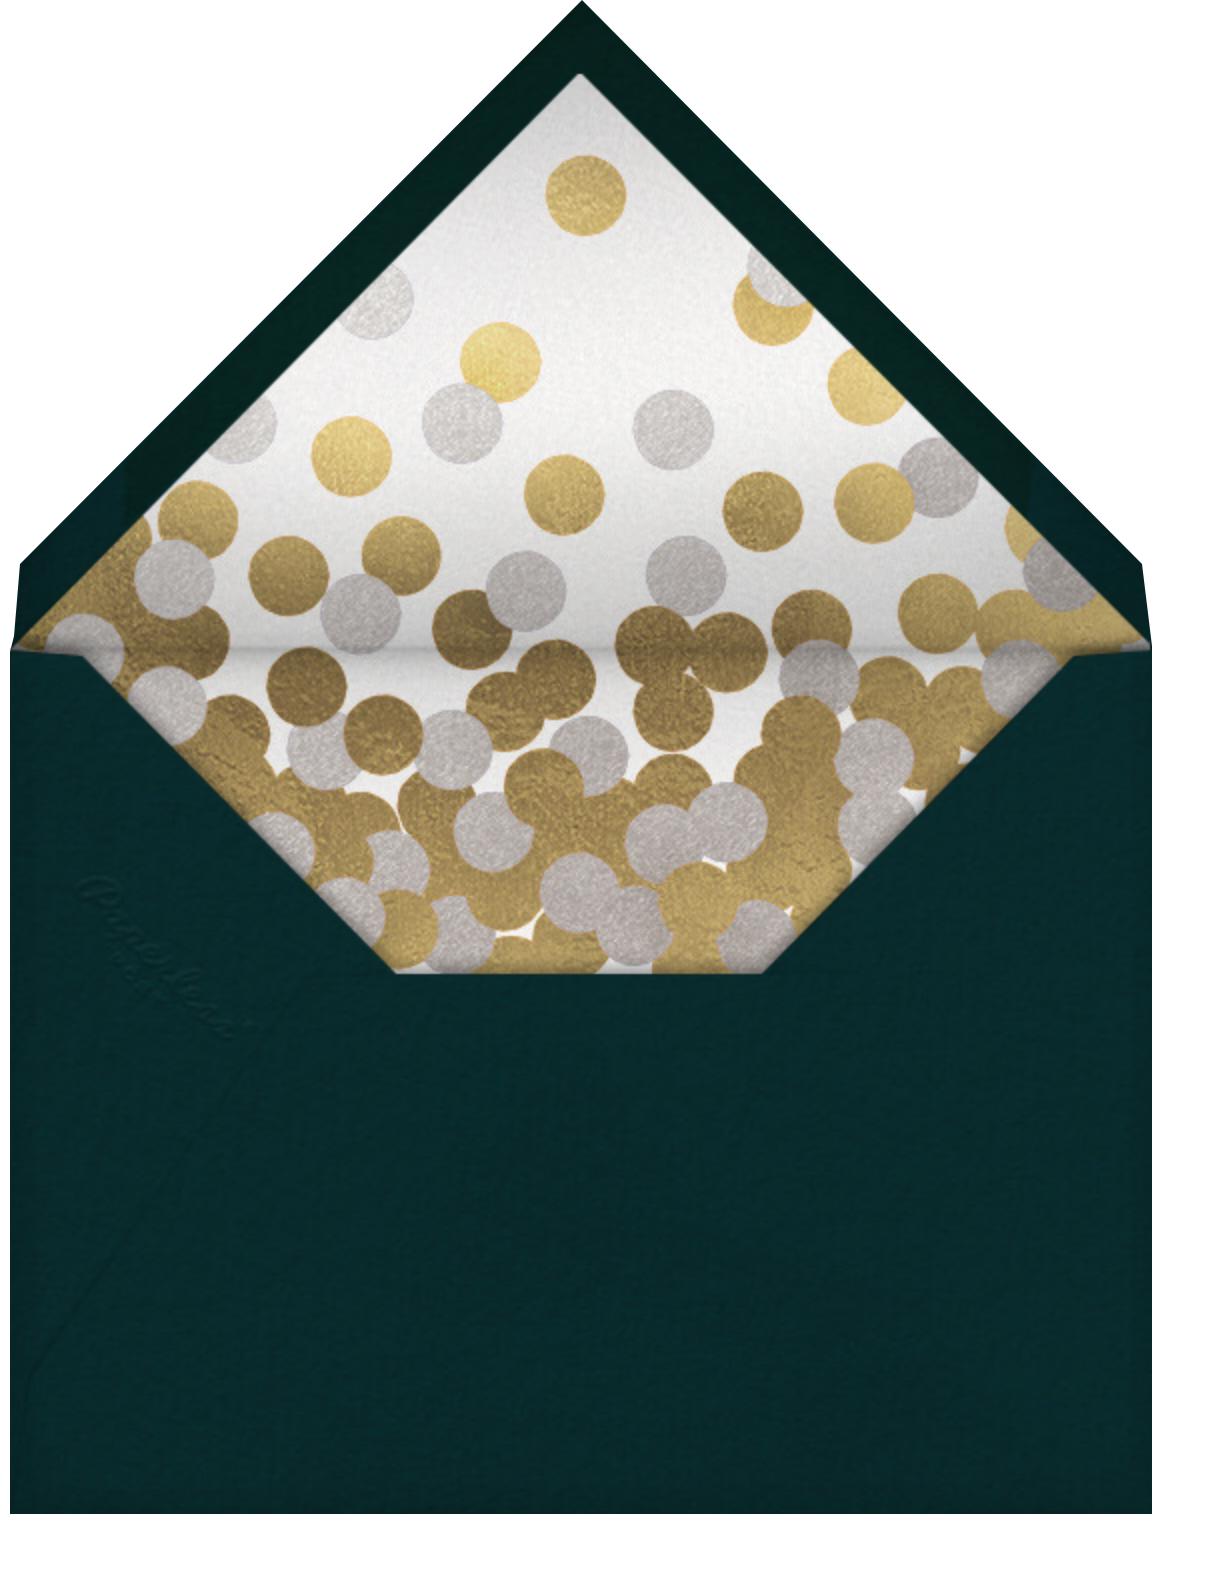 Retrospective 2020 (4 Multi-Photo) - Gold - Paperless Post - Envelope